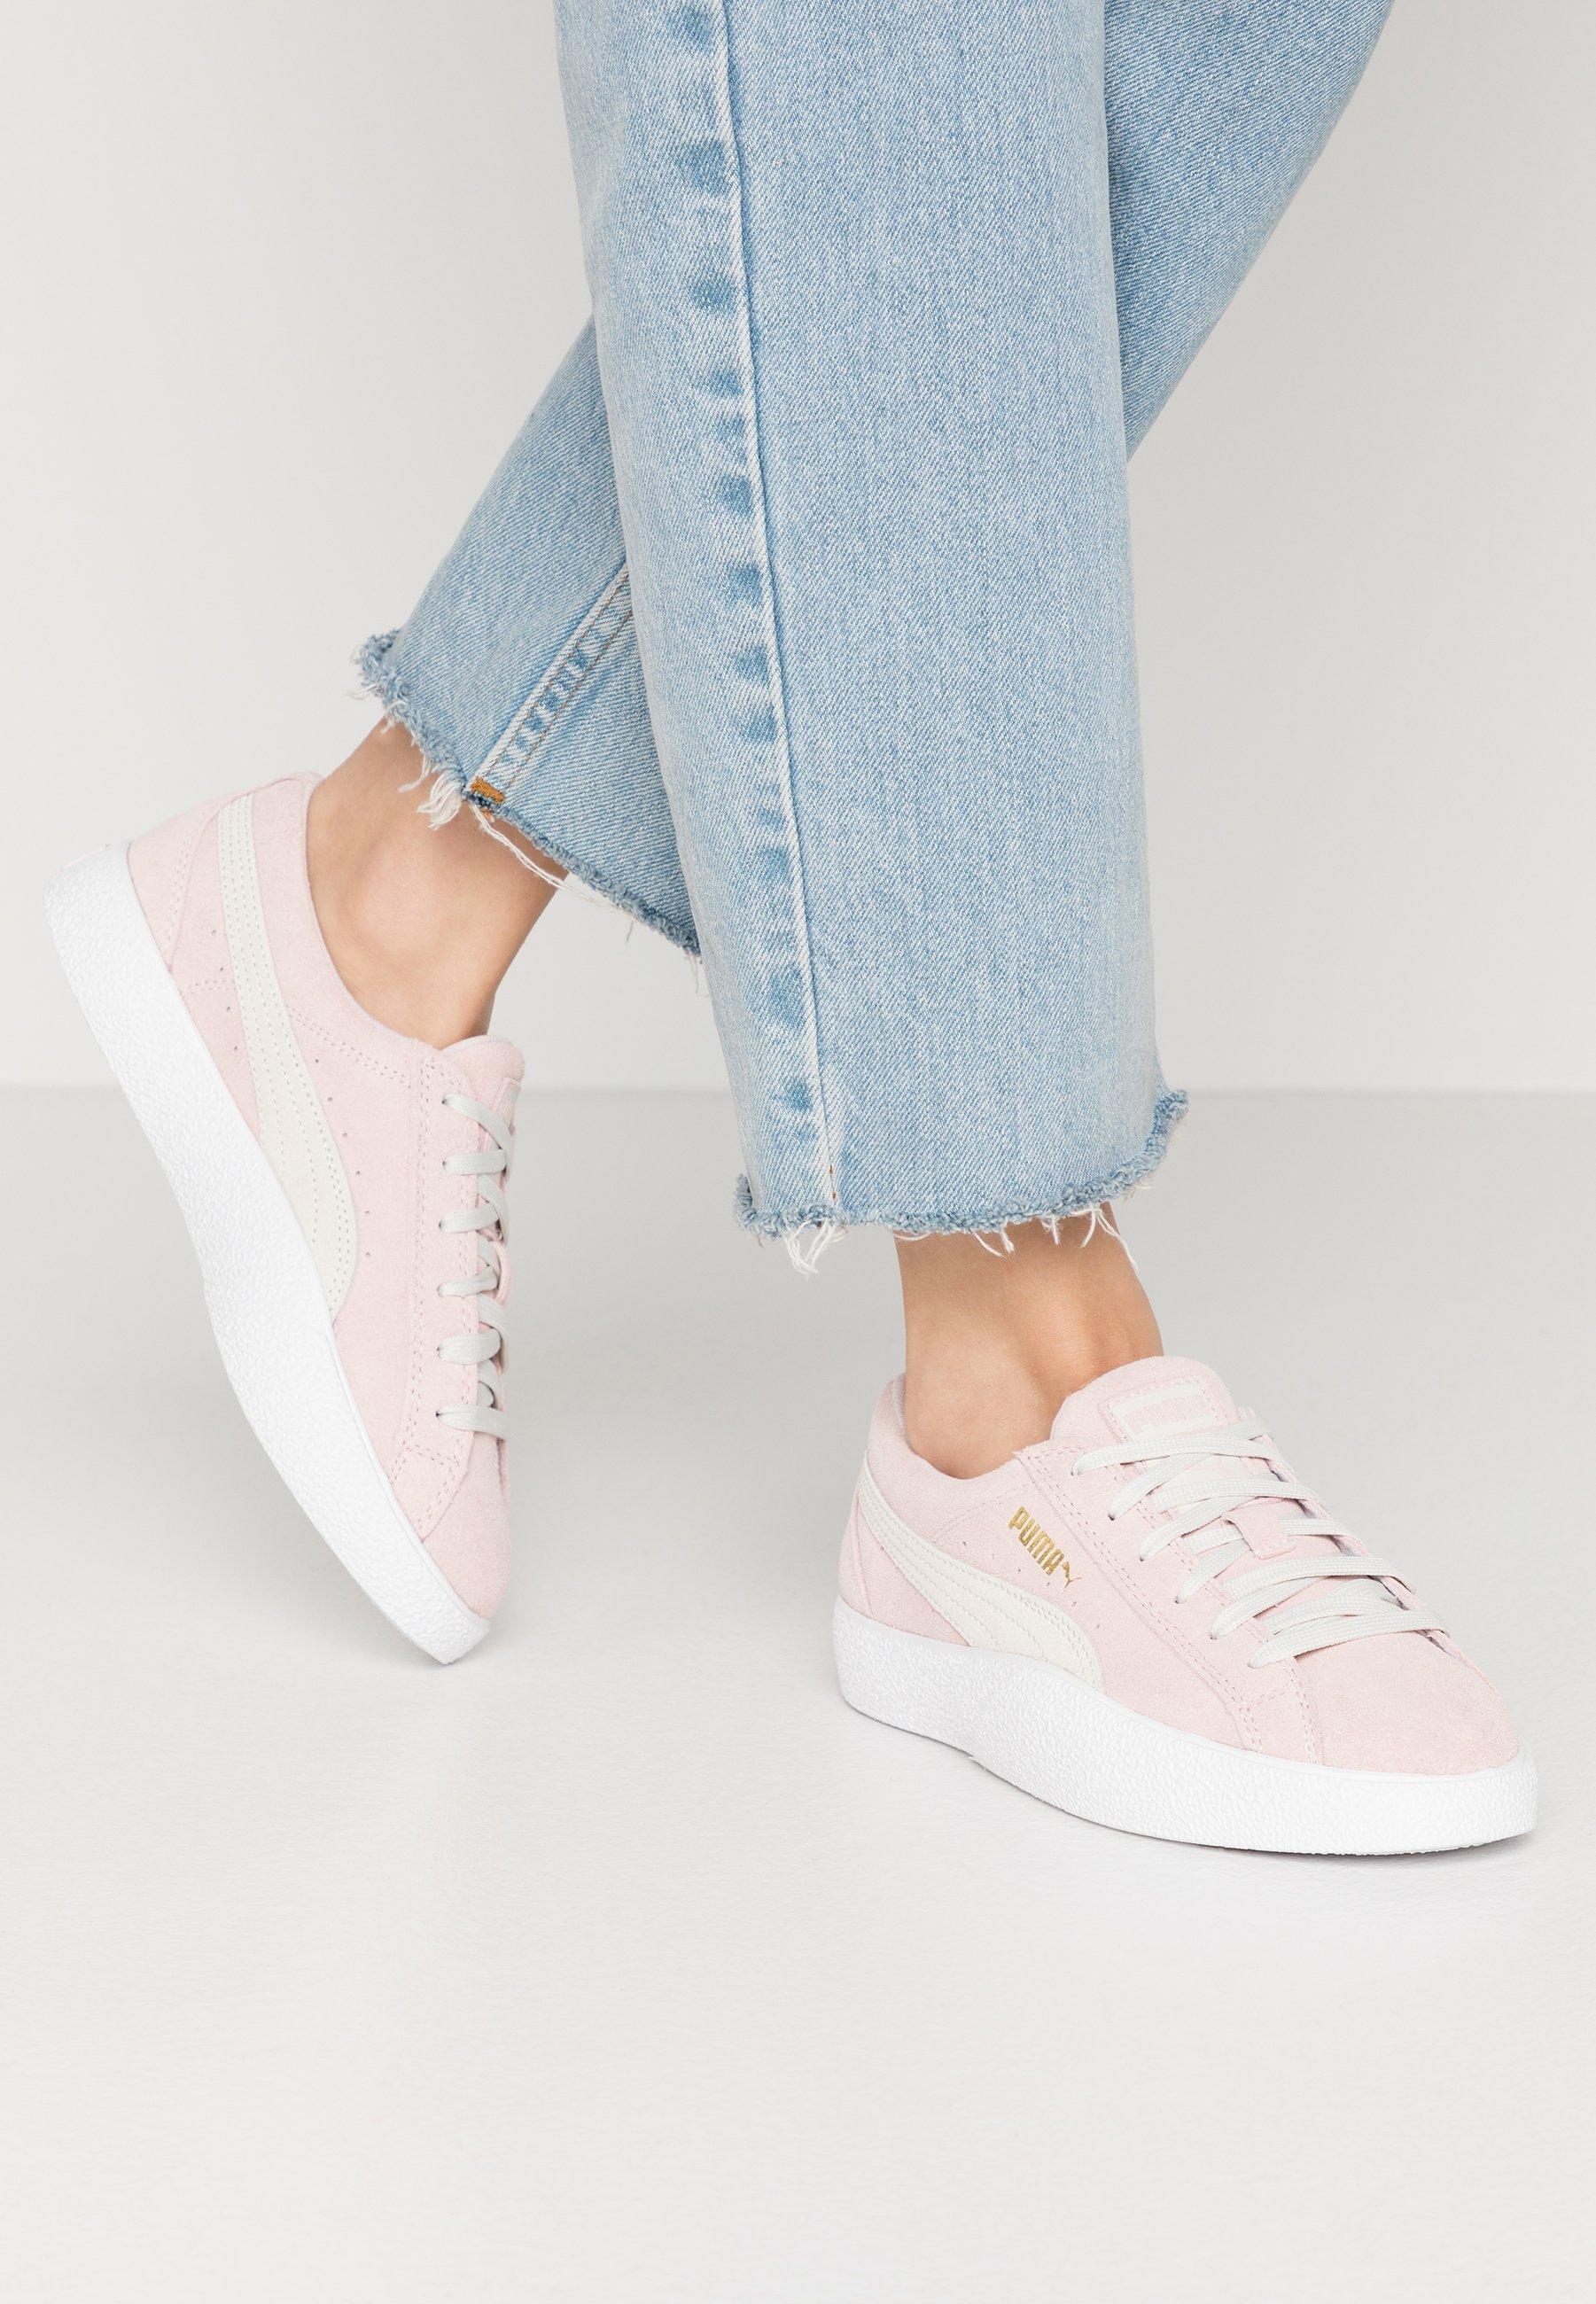 Puma RALPH SAMPSON Sneakers laag whitebridal rose